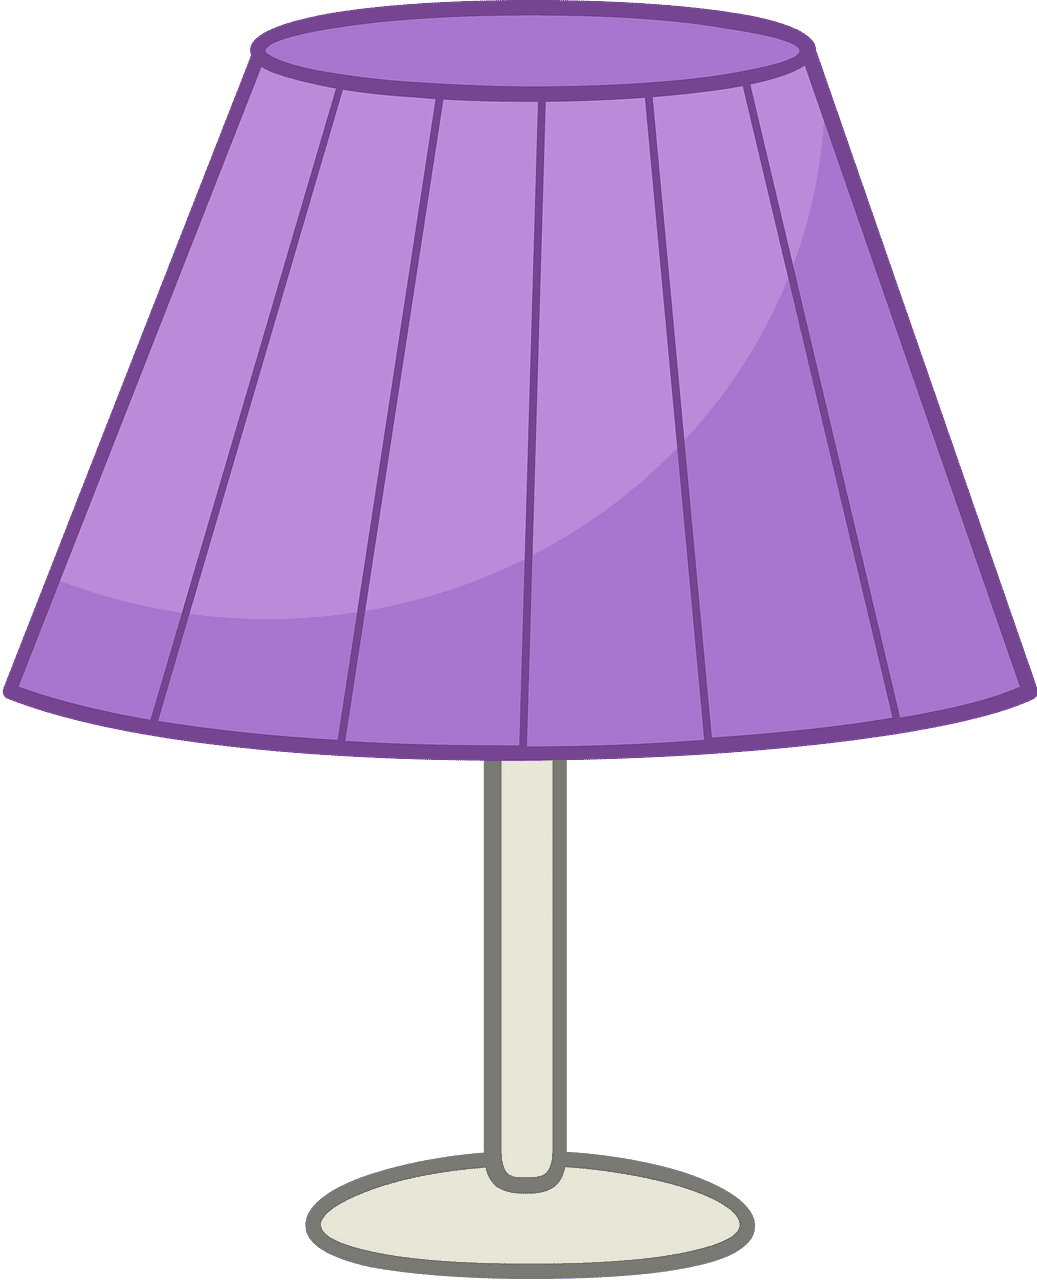 Lamp clipart transparent background 6